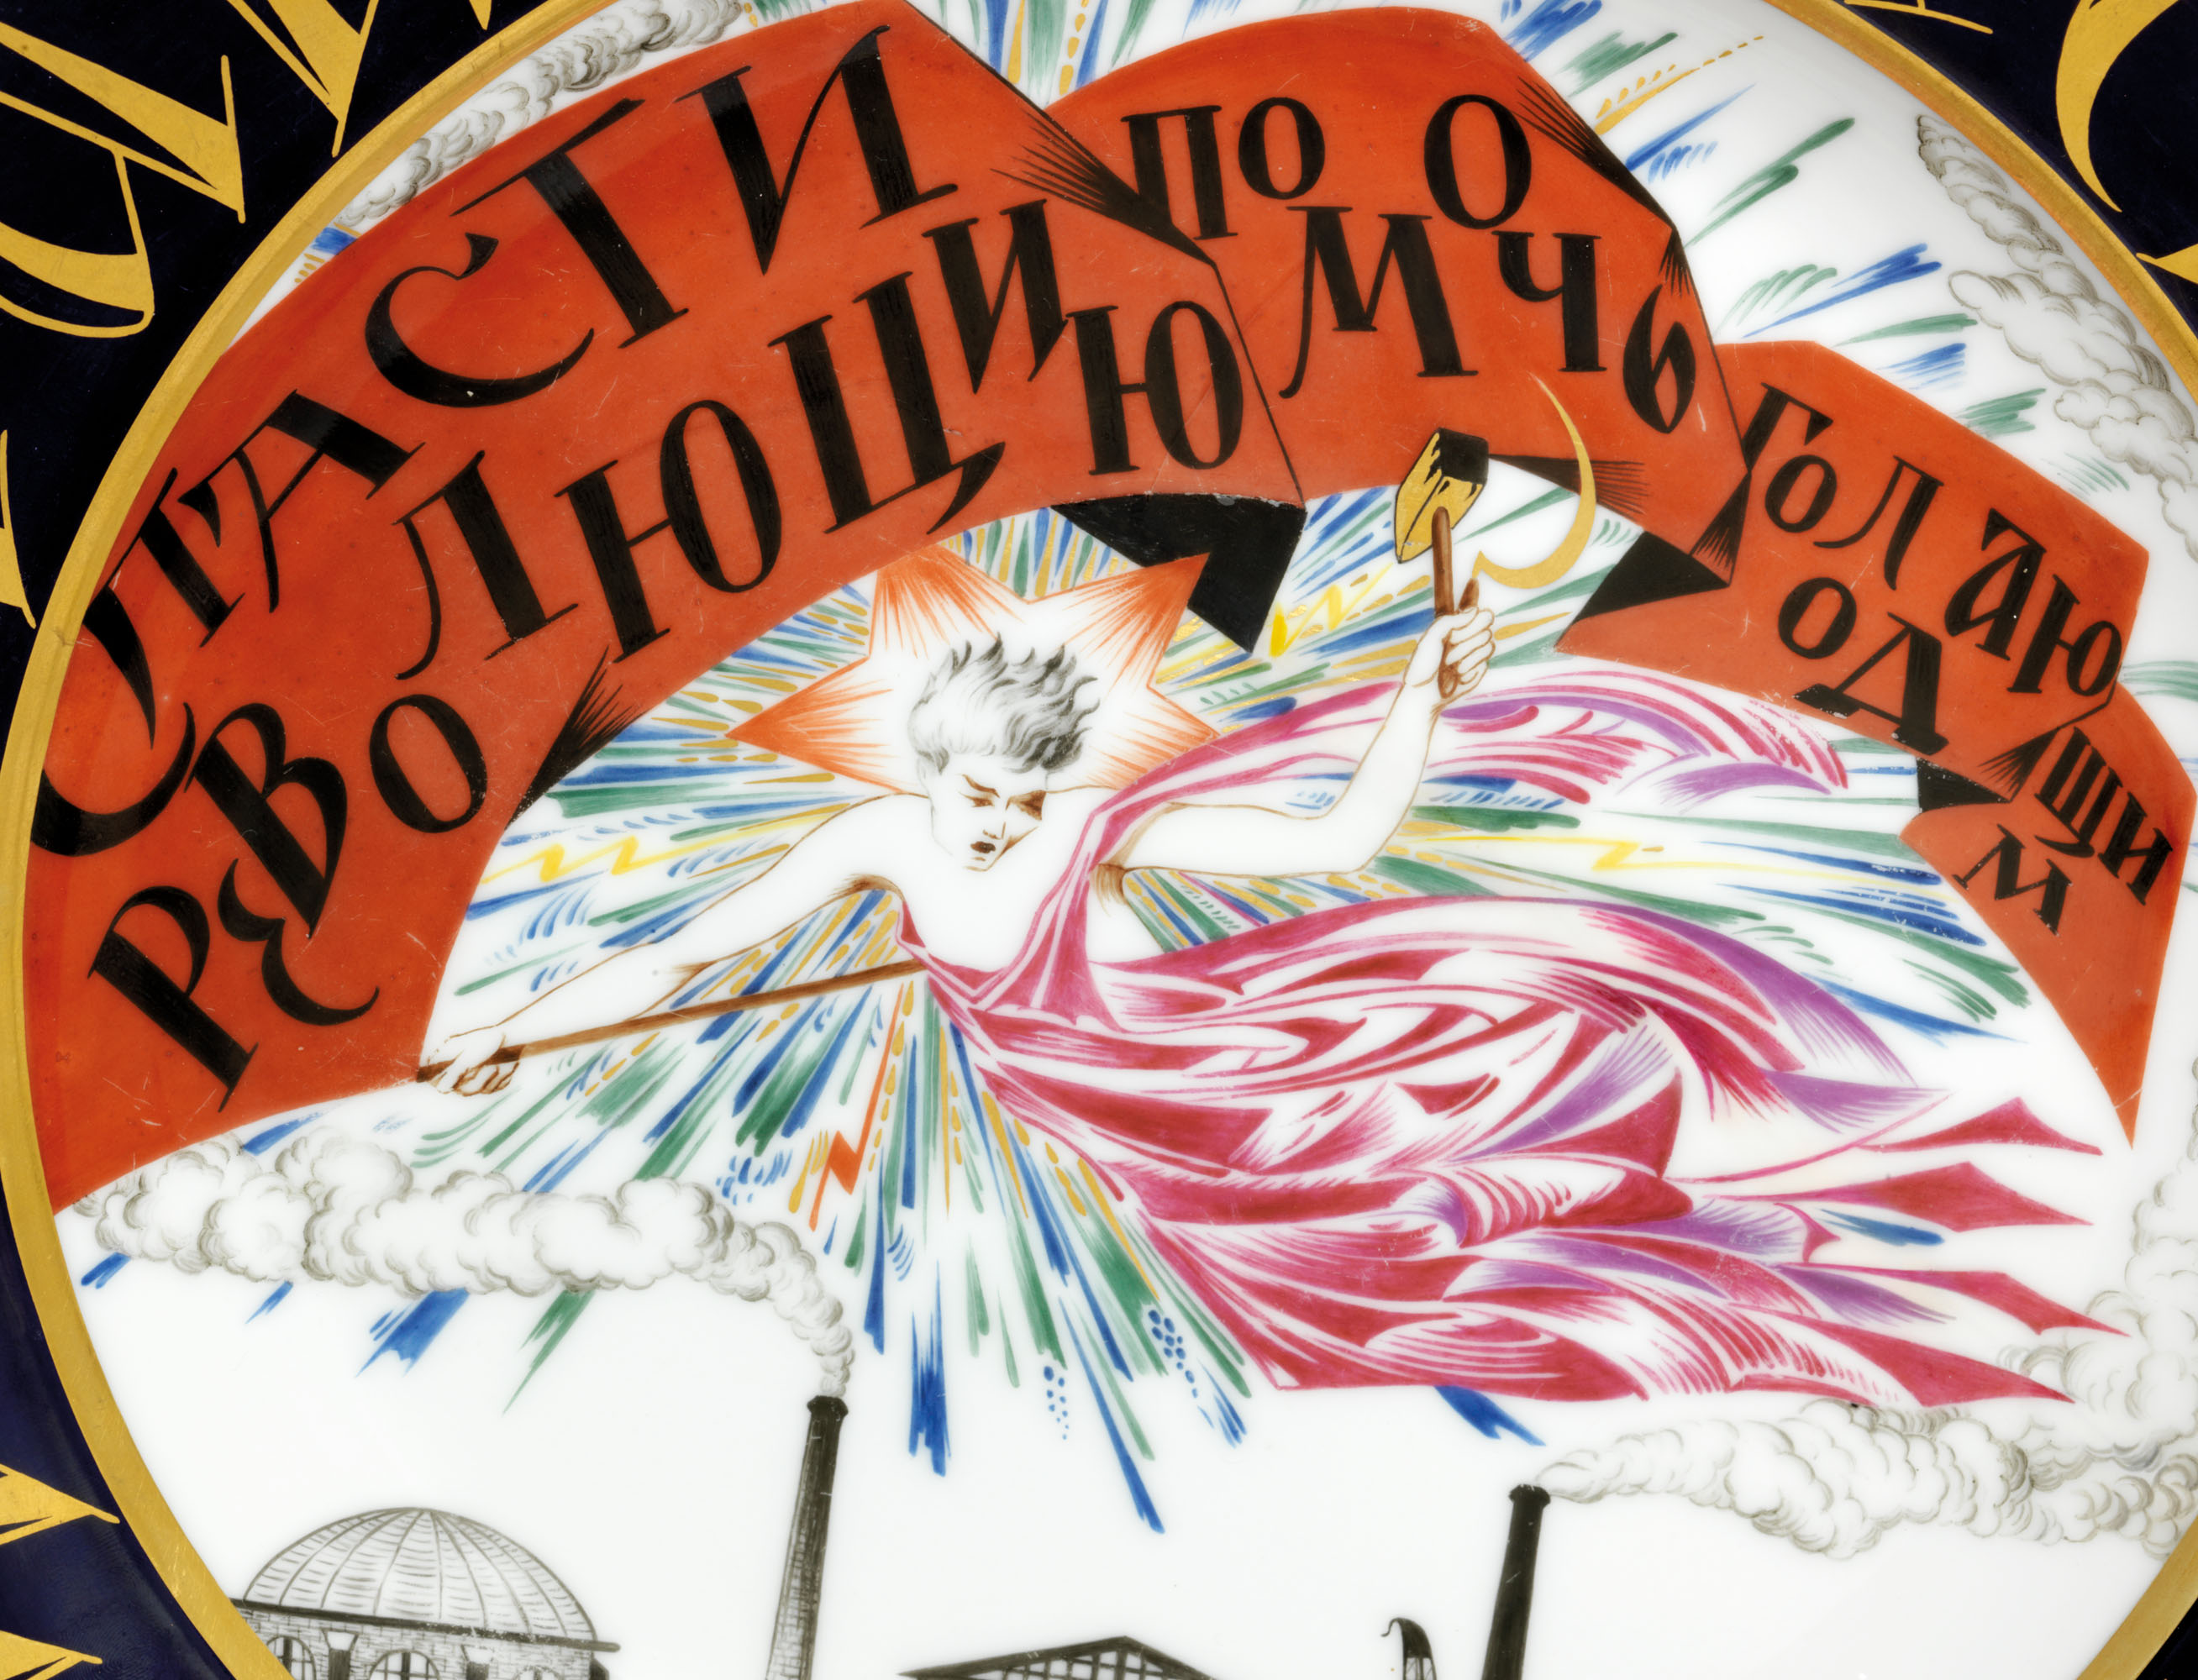 A RARE SOVIET PROPAGANDA PORCELAIN PLATTER